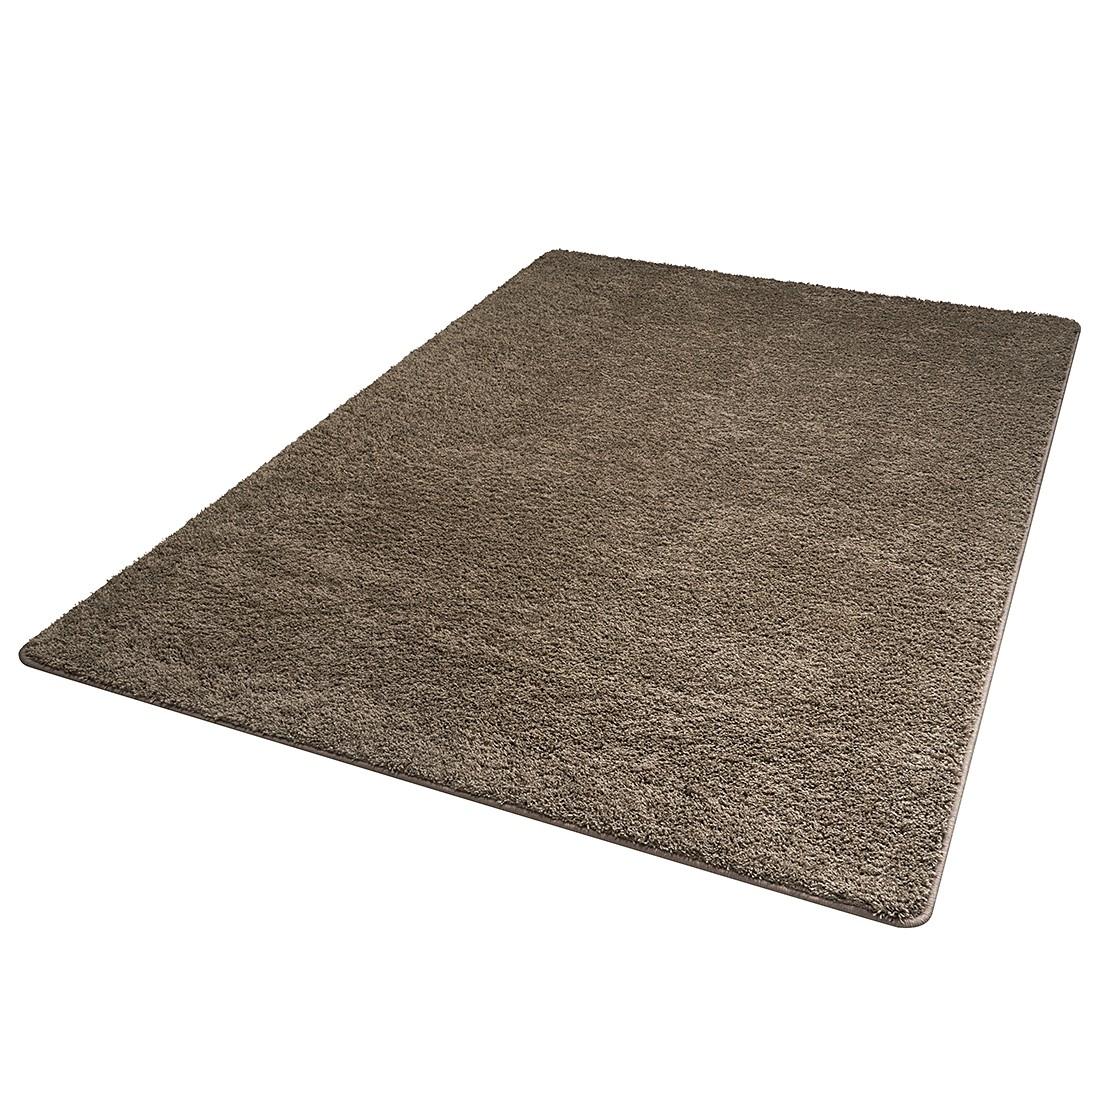 Teppich Noblesse Classic – Sand – 170 x 230 cm, DEKOWE günstig